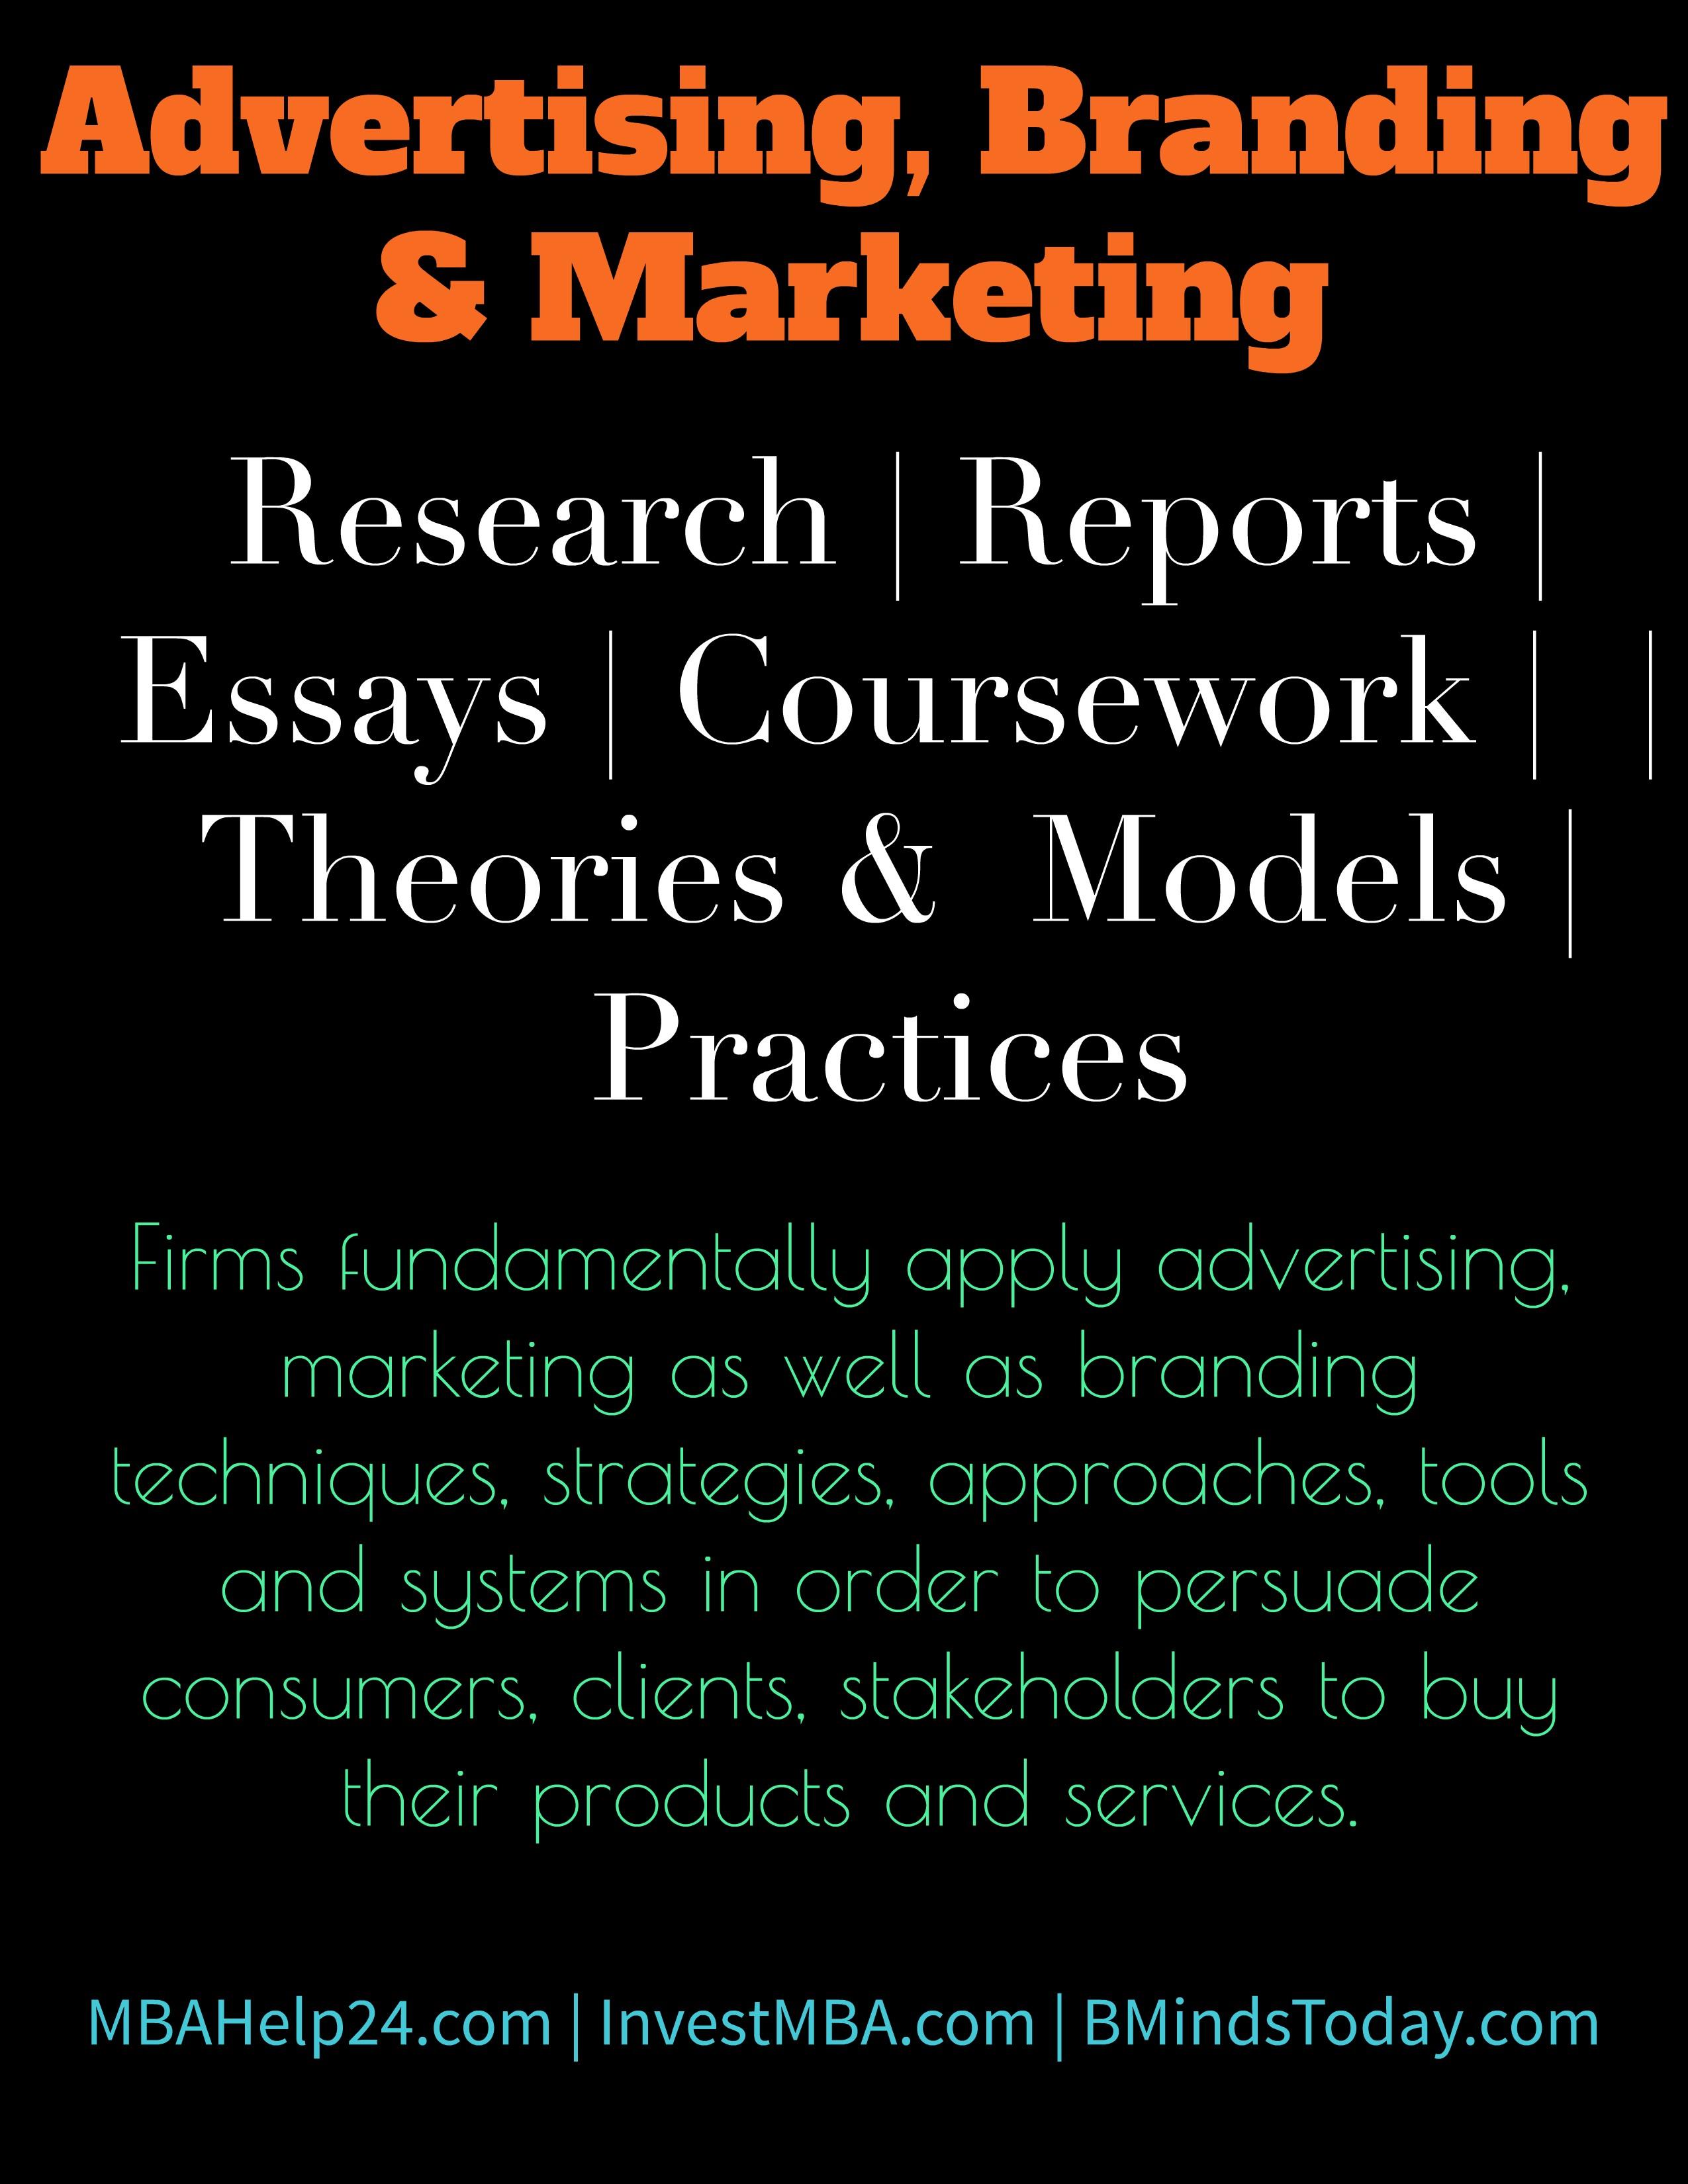 Branding-advertising and Marketing